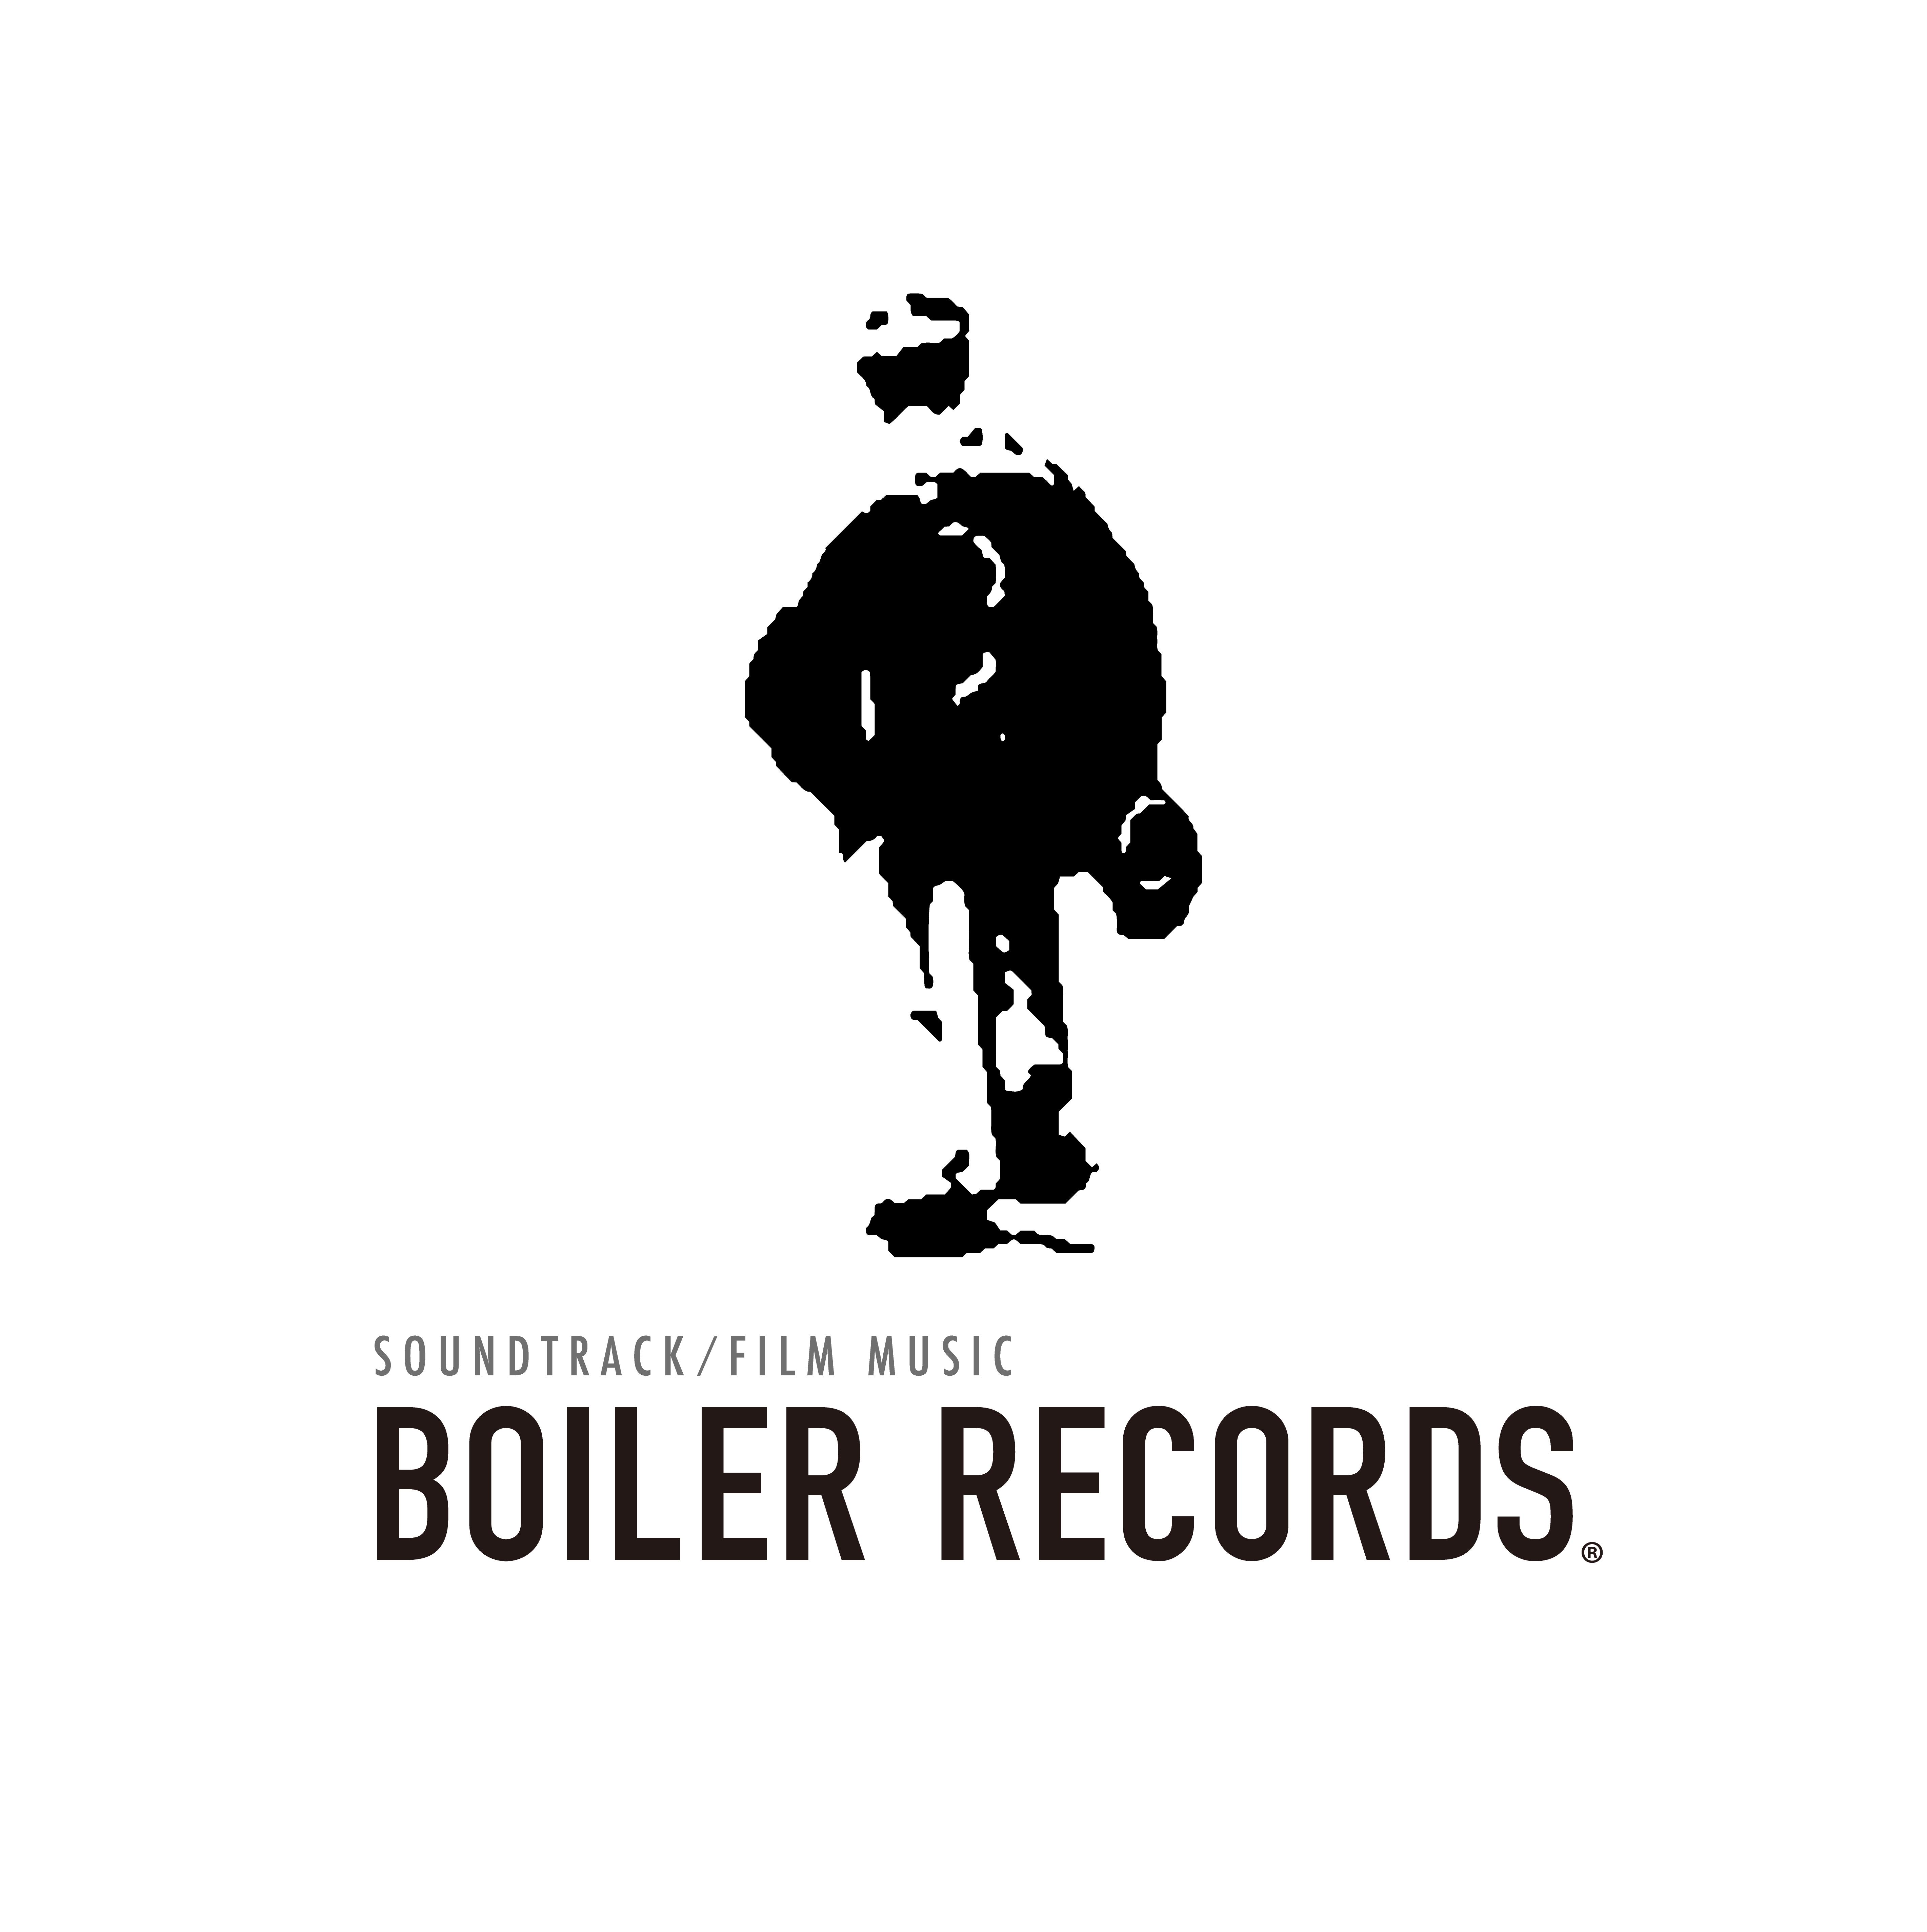 BOILER RECORDS®